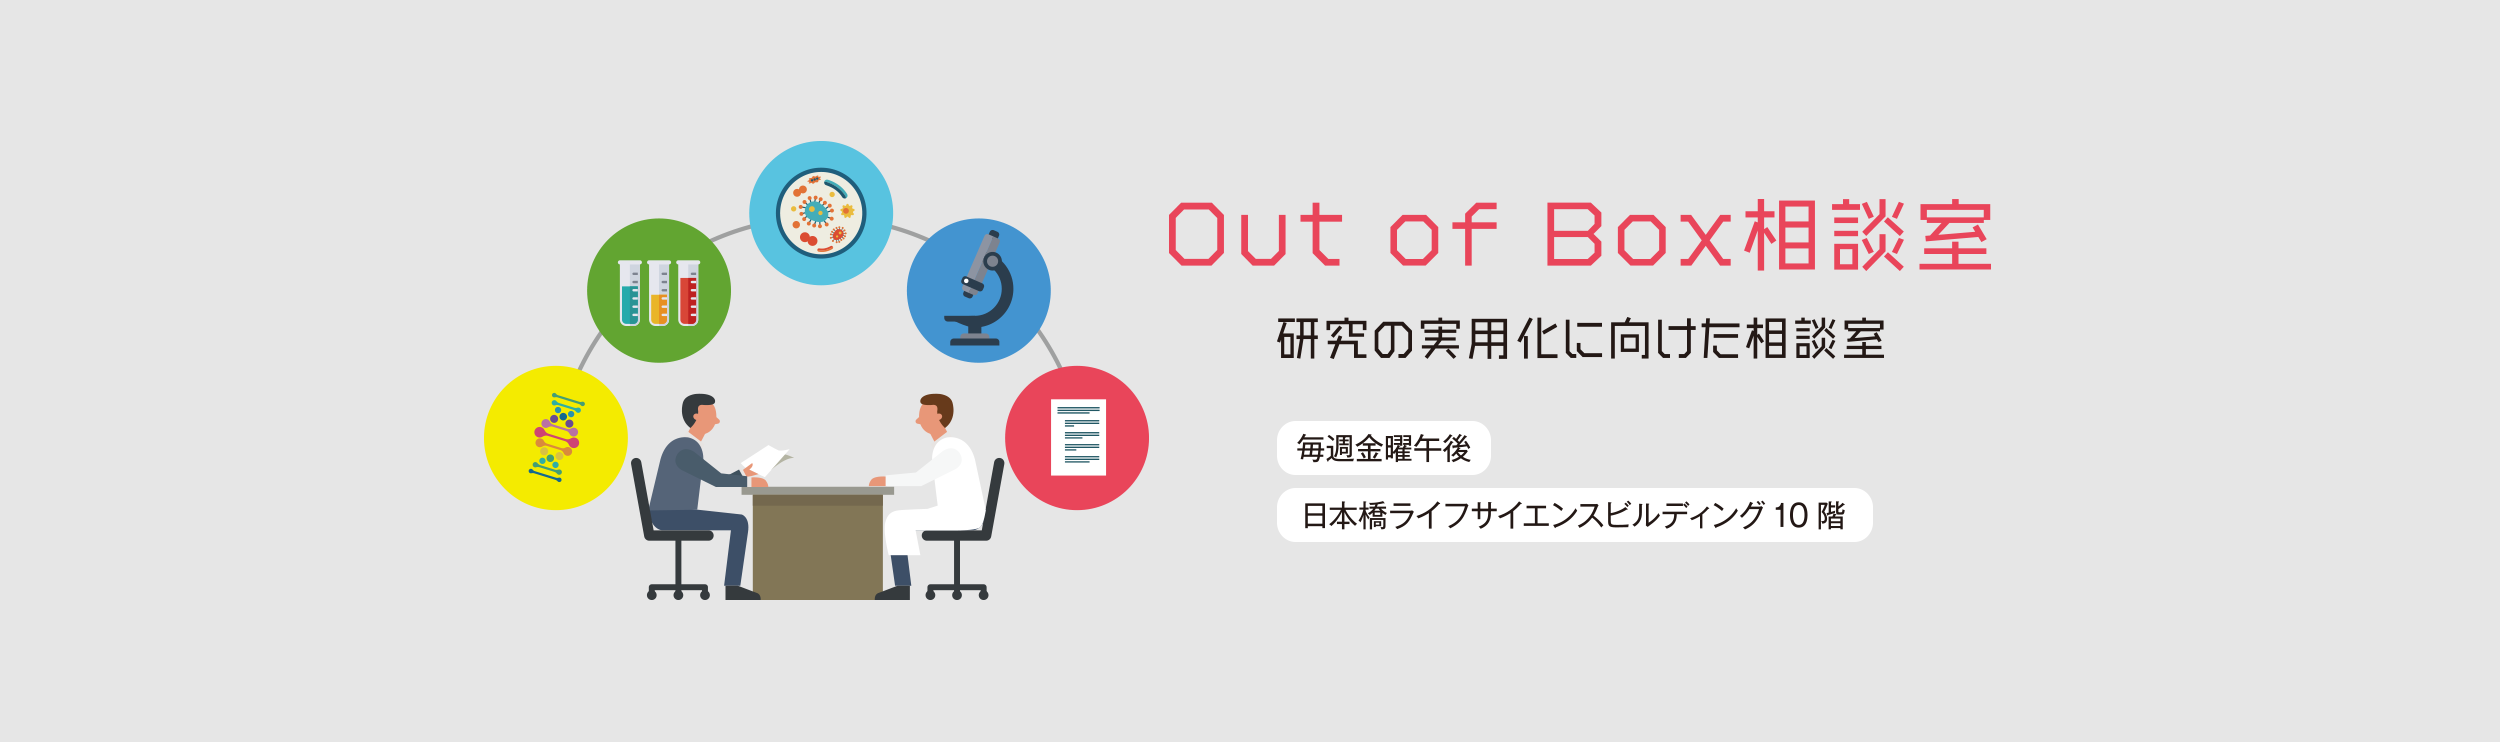 OOB_banner.png